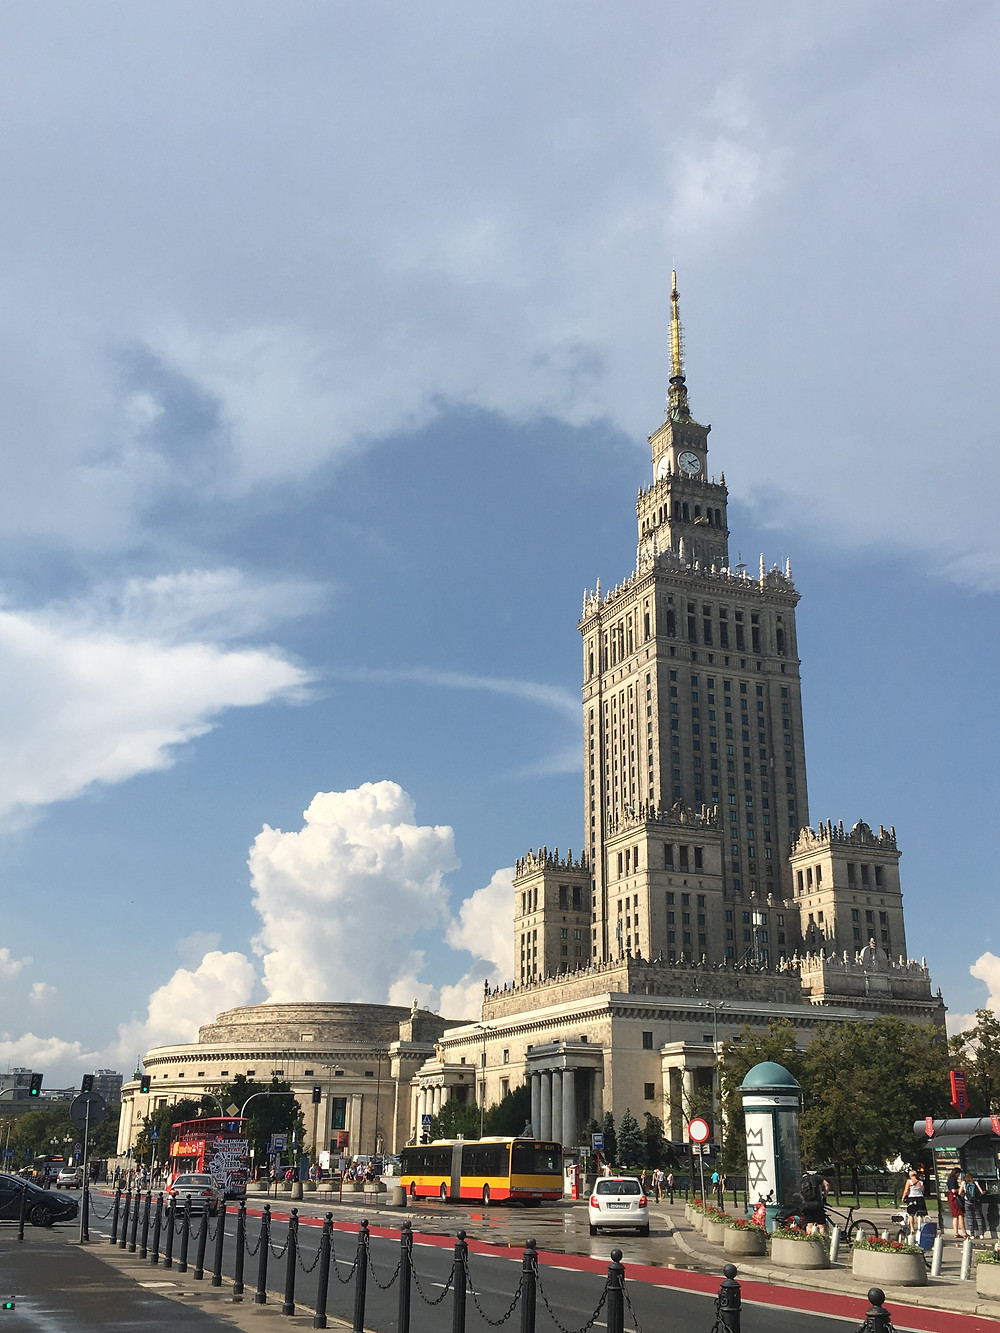 Warsaw, Pałac Kultury i Nauki